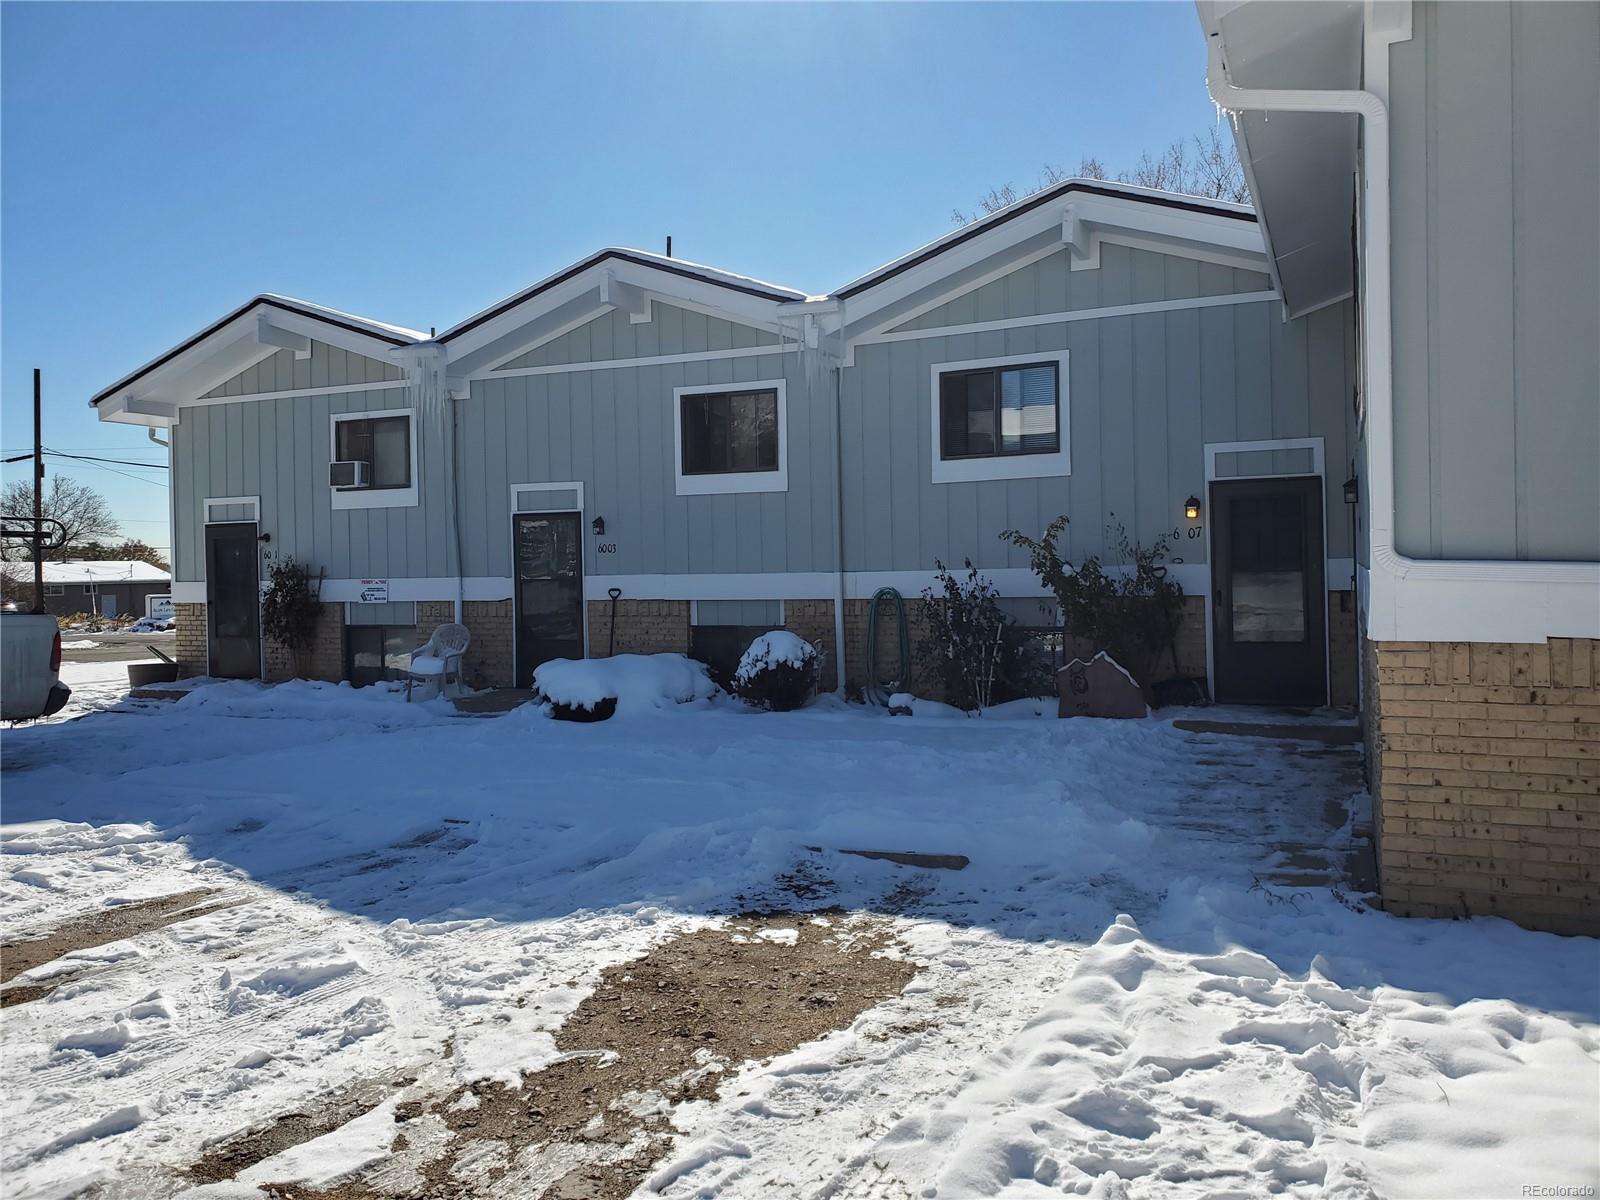 6001 Harlan Street, Arvada, CO 80003 - Arvada, CO real estate listing